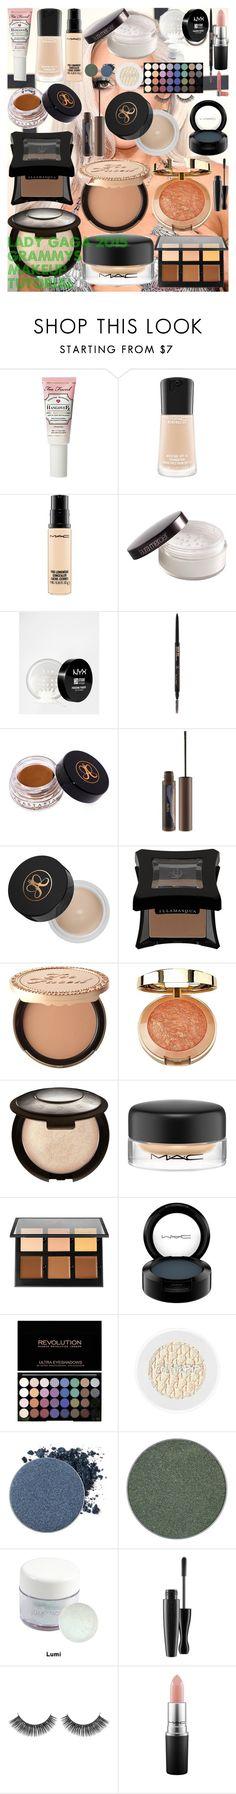 """Lady Gaga 2015 Grammys Makeup Tutorial"" by oroartye-1 on Polyvore featuring beauty, Too Faced Cosmetics, MAC Cosmetics, Laura Mercier, NYX, Anastasia Beverly Hills, tarte, Illamasqua, Milani and Becca"